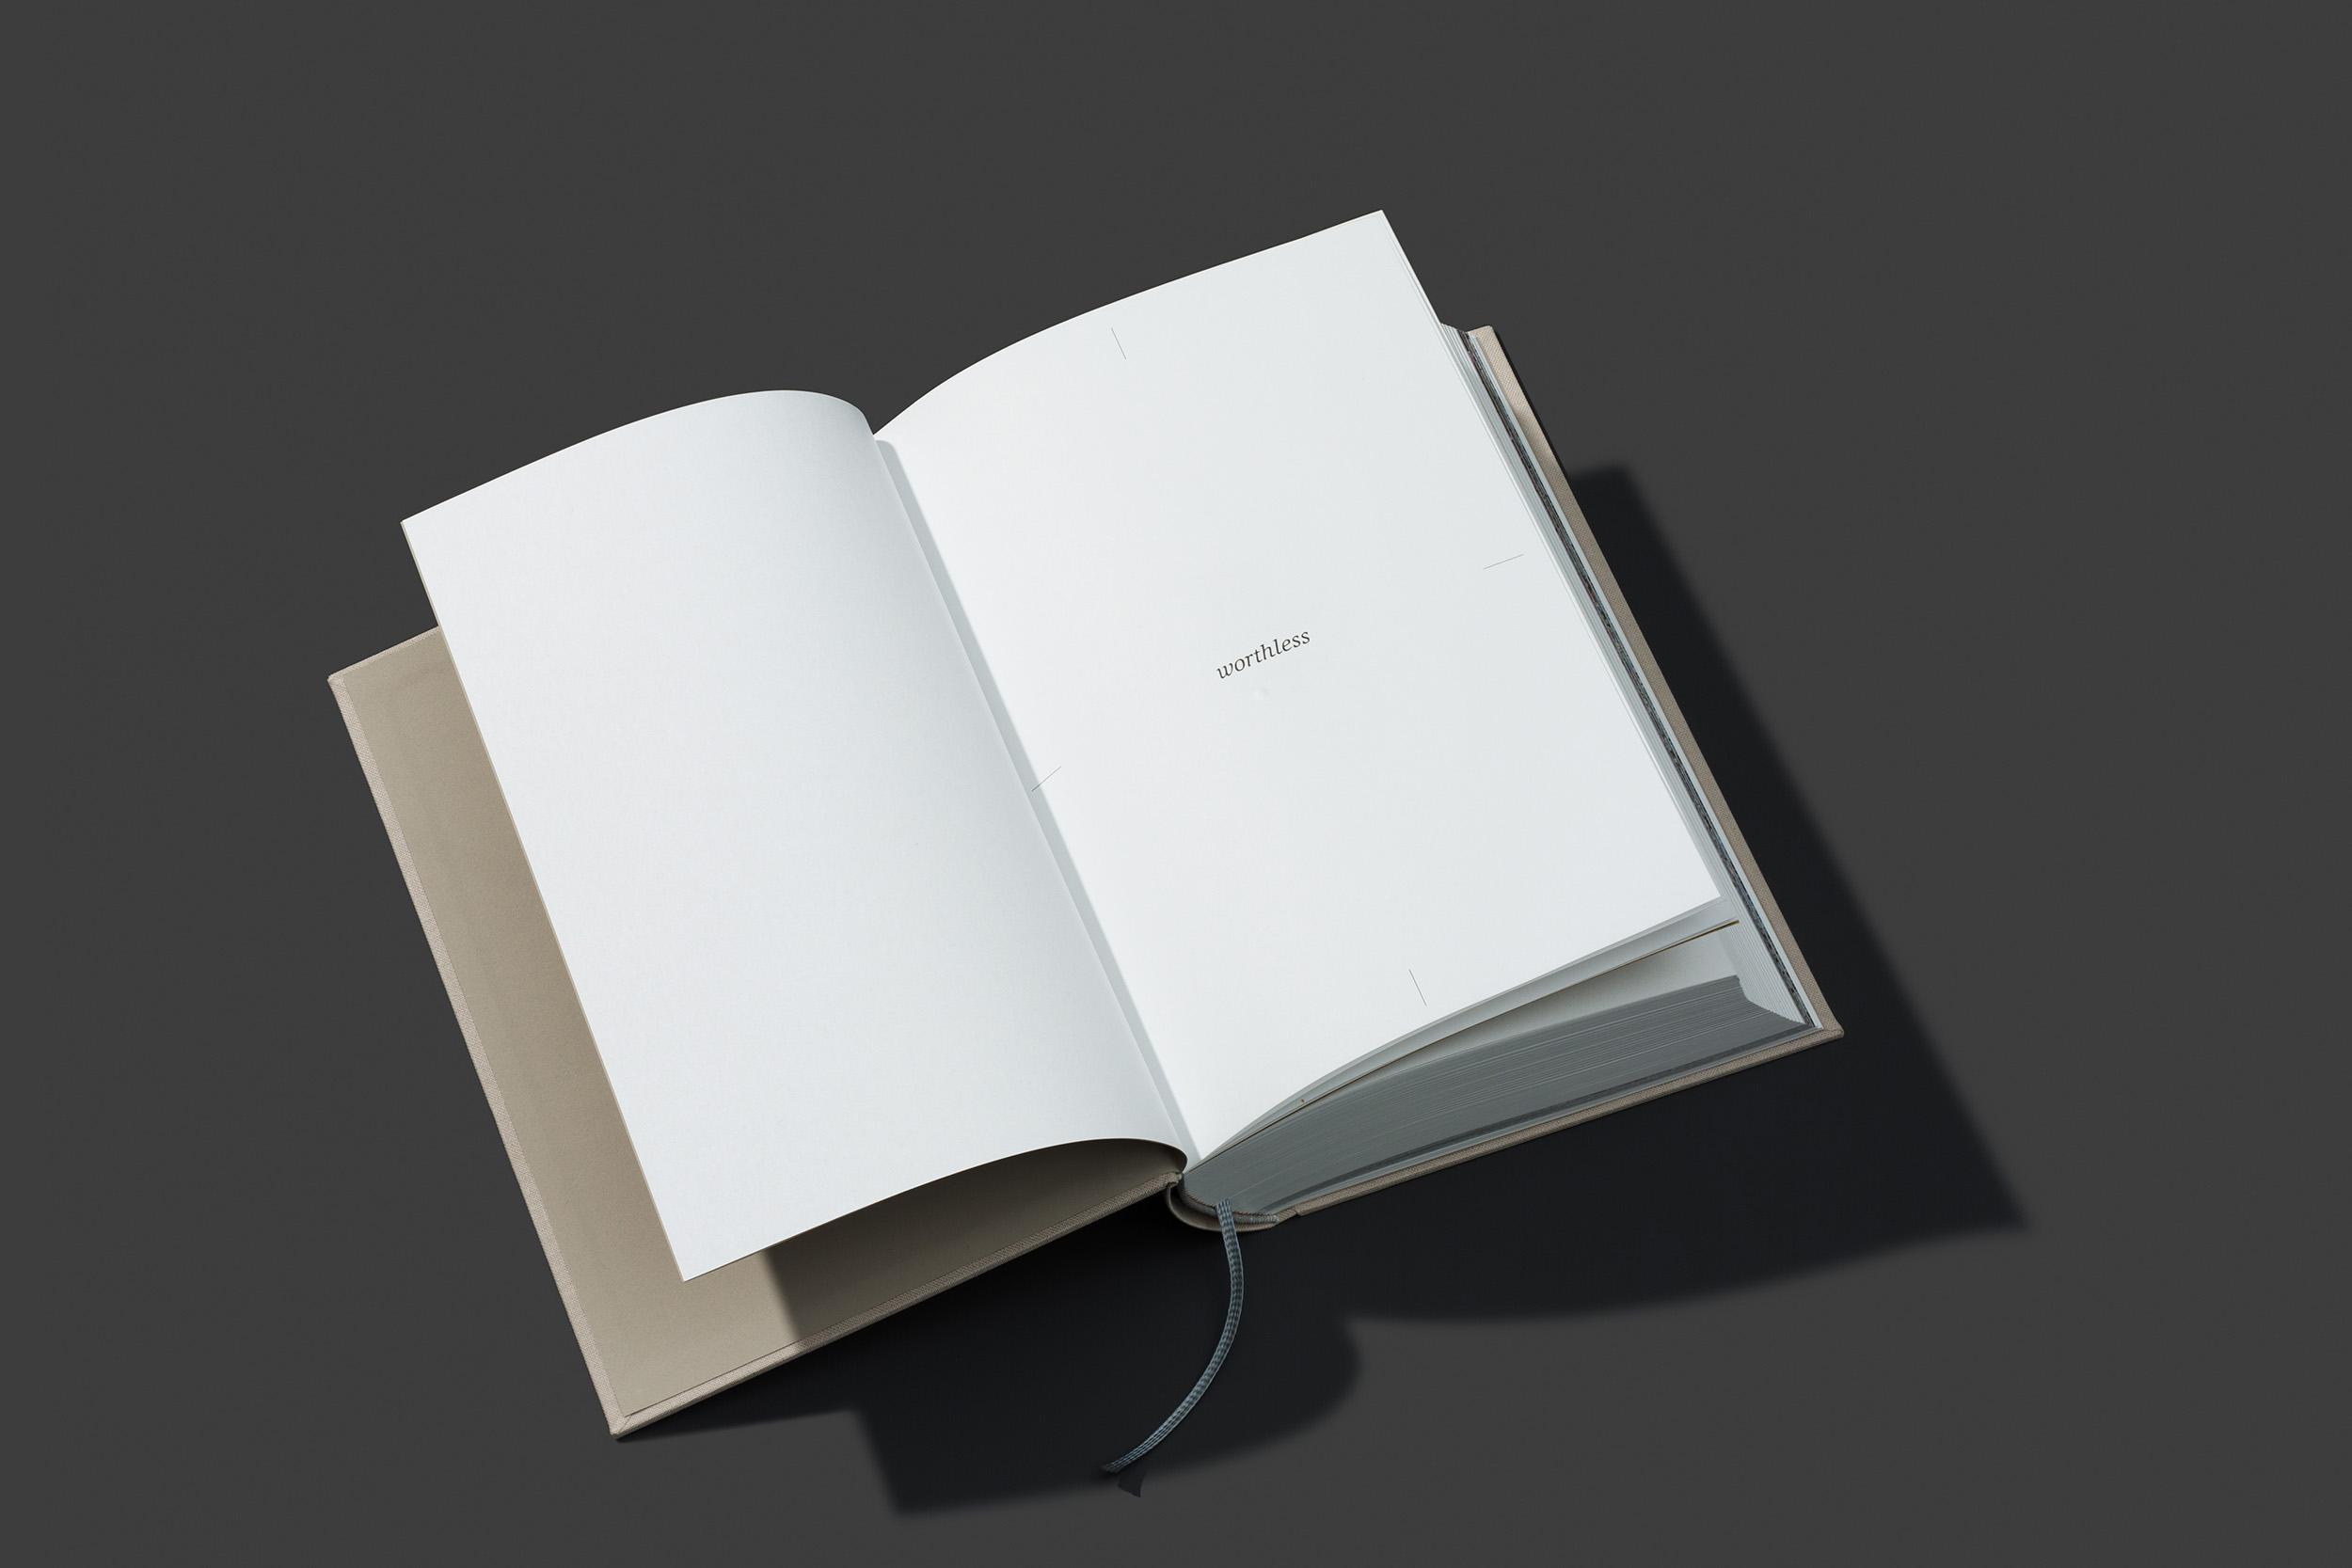 worthless_book_02.jpg